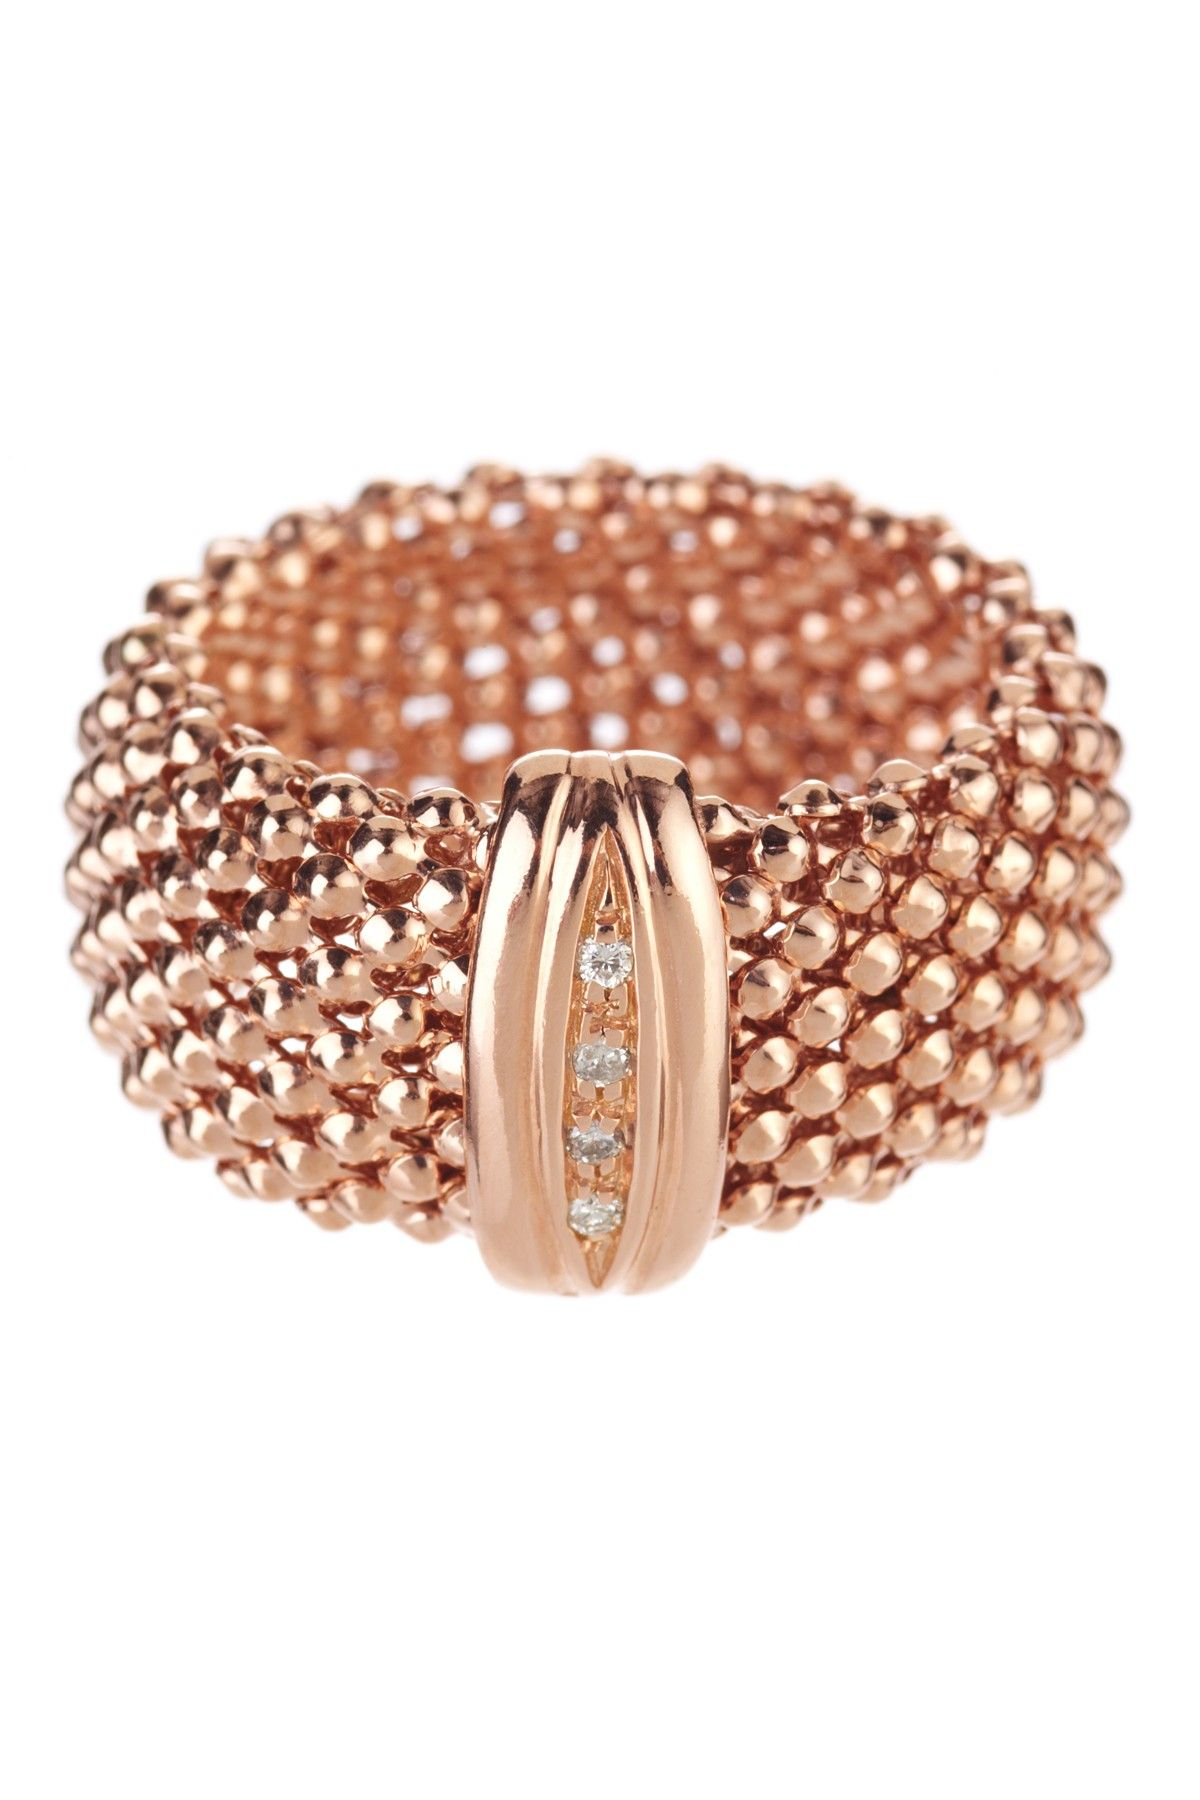 Rose gold u diamonds ring jewlery pinterest rose gold diamond